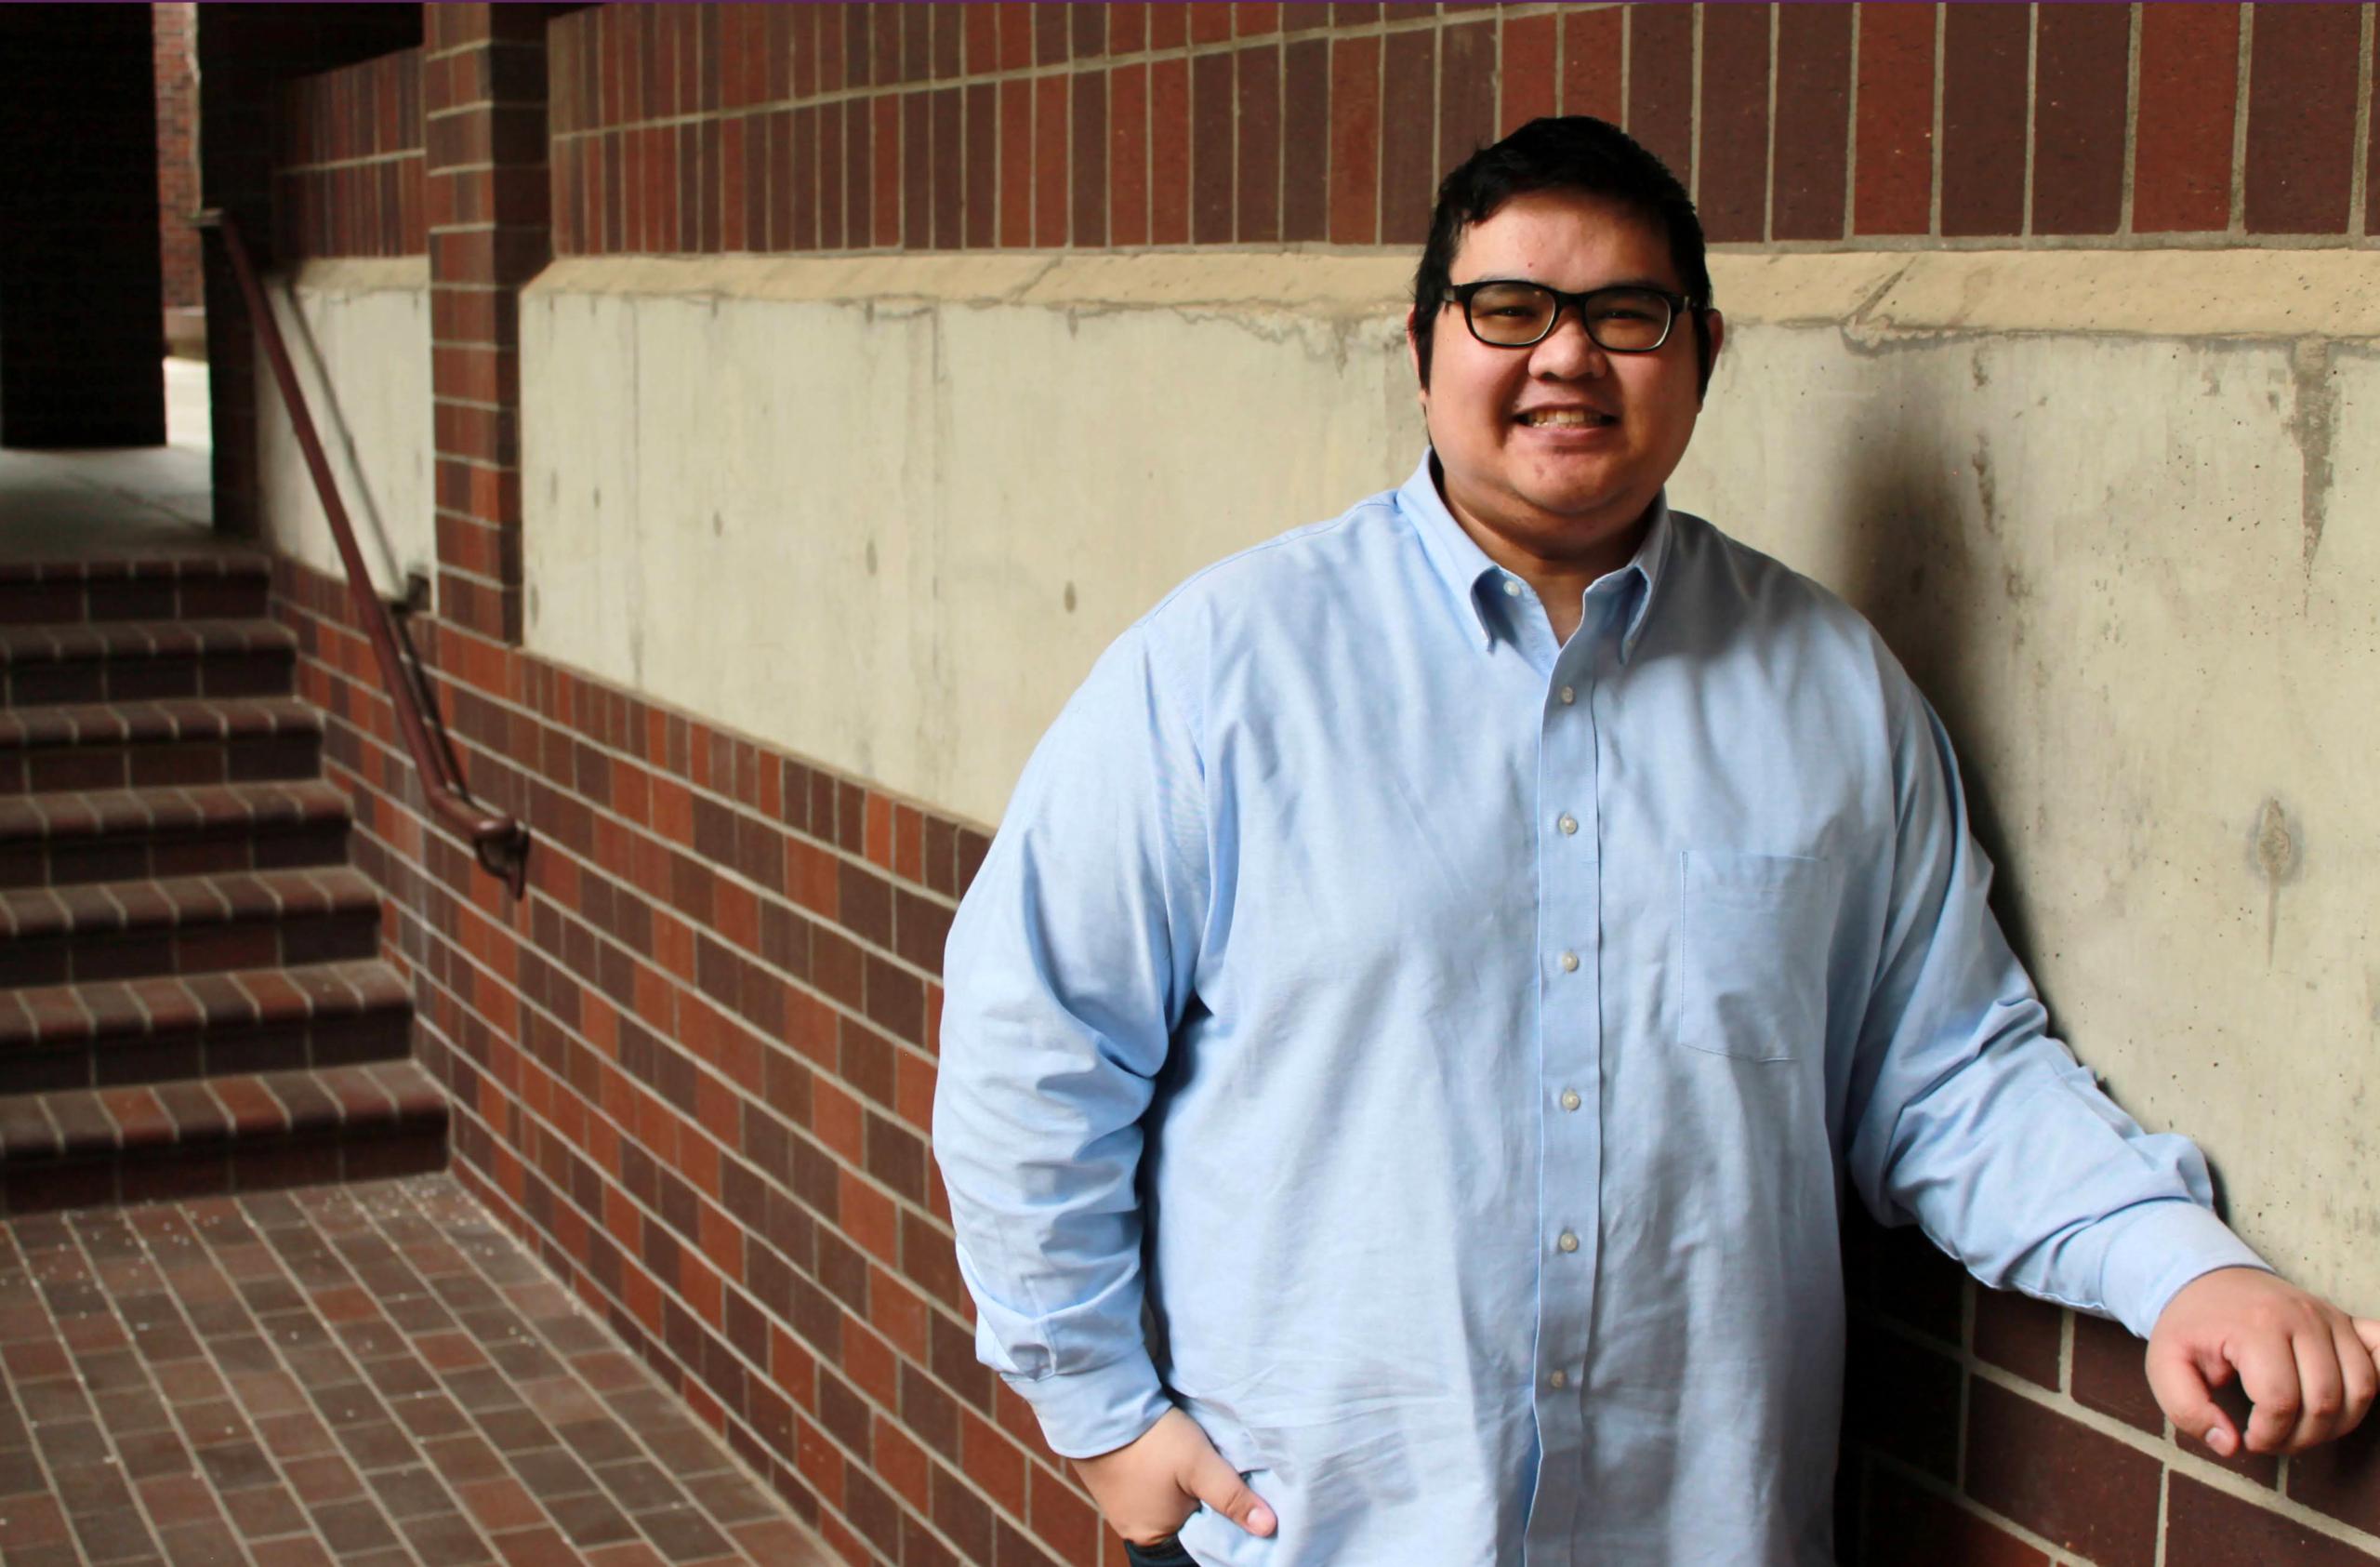 today.csuchico.edu: Diversity Fellow Finds Niche in AAPI Politics